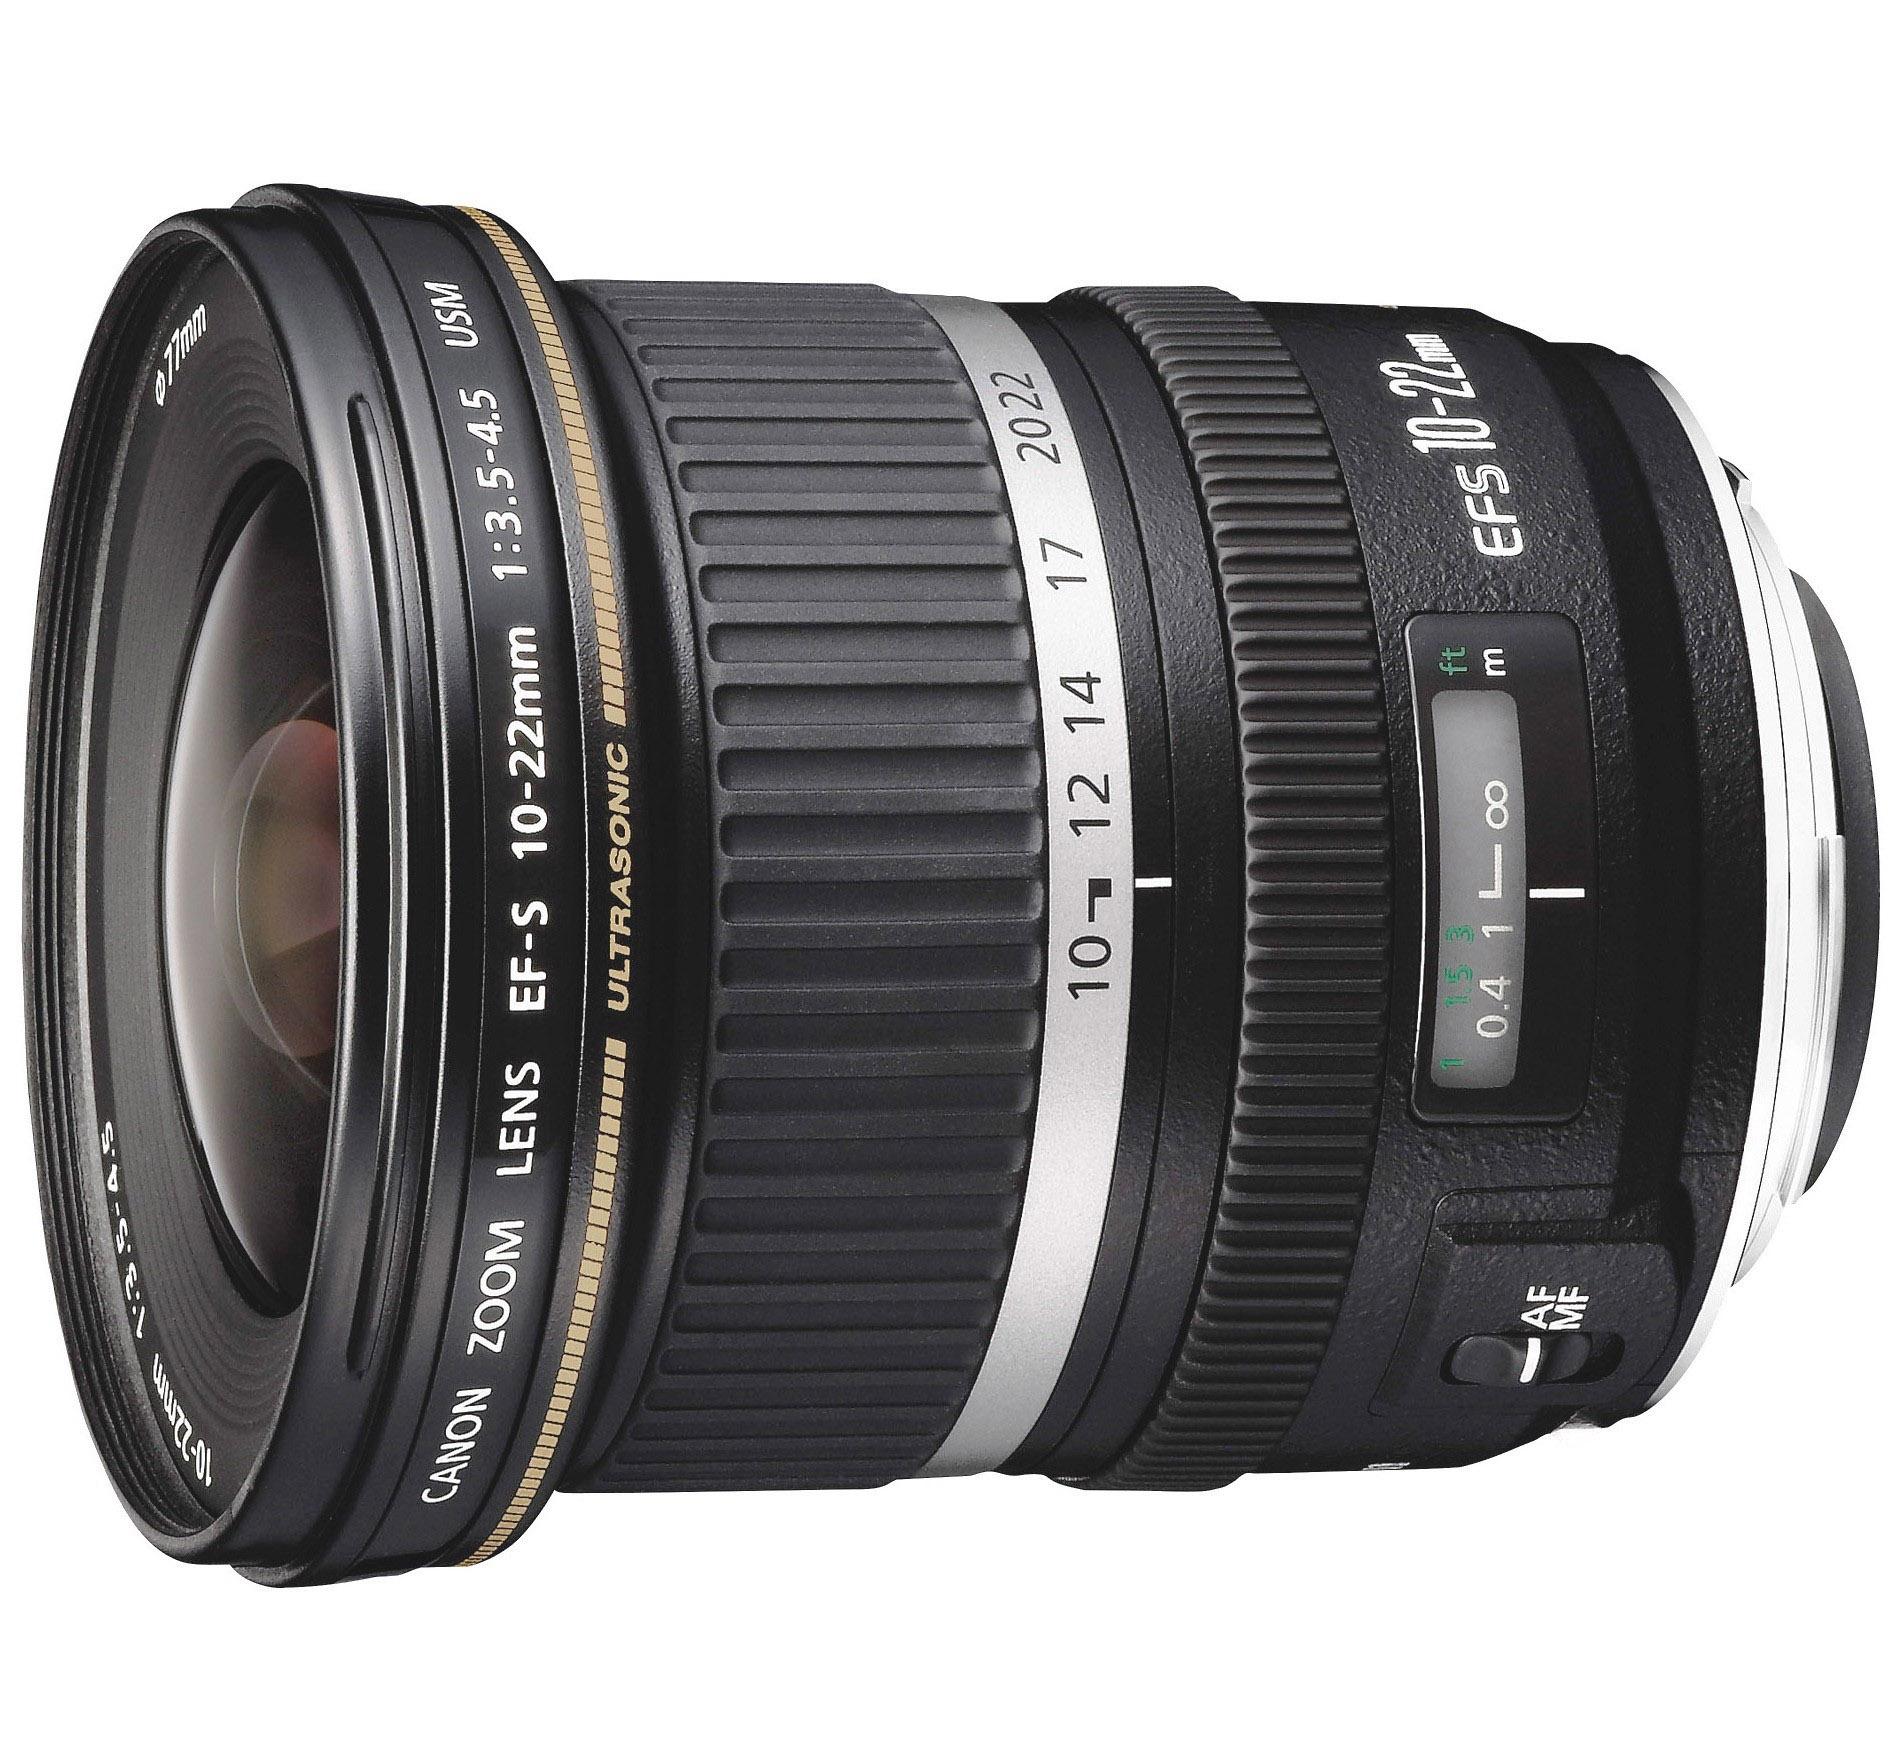 Canon EFS 10-22mm f3.5-4.5 USM Lens